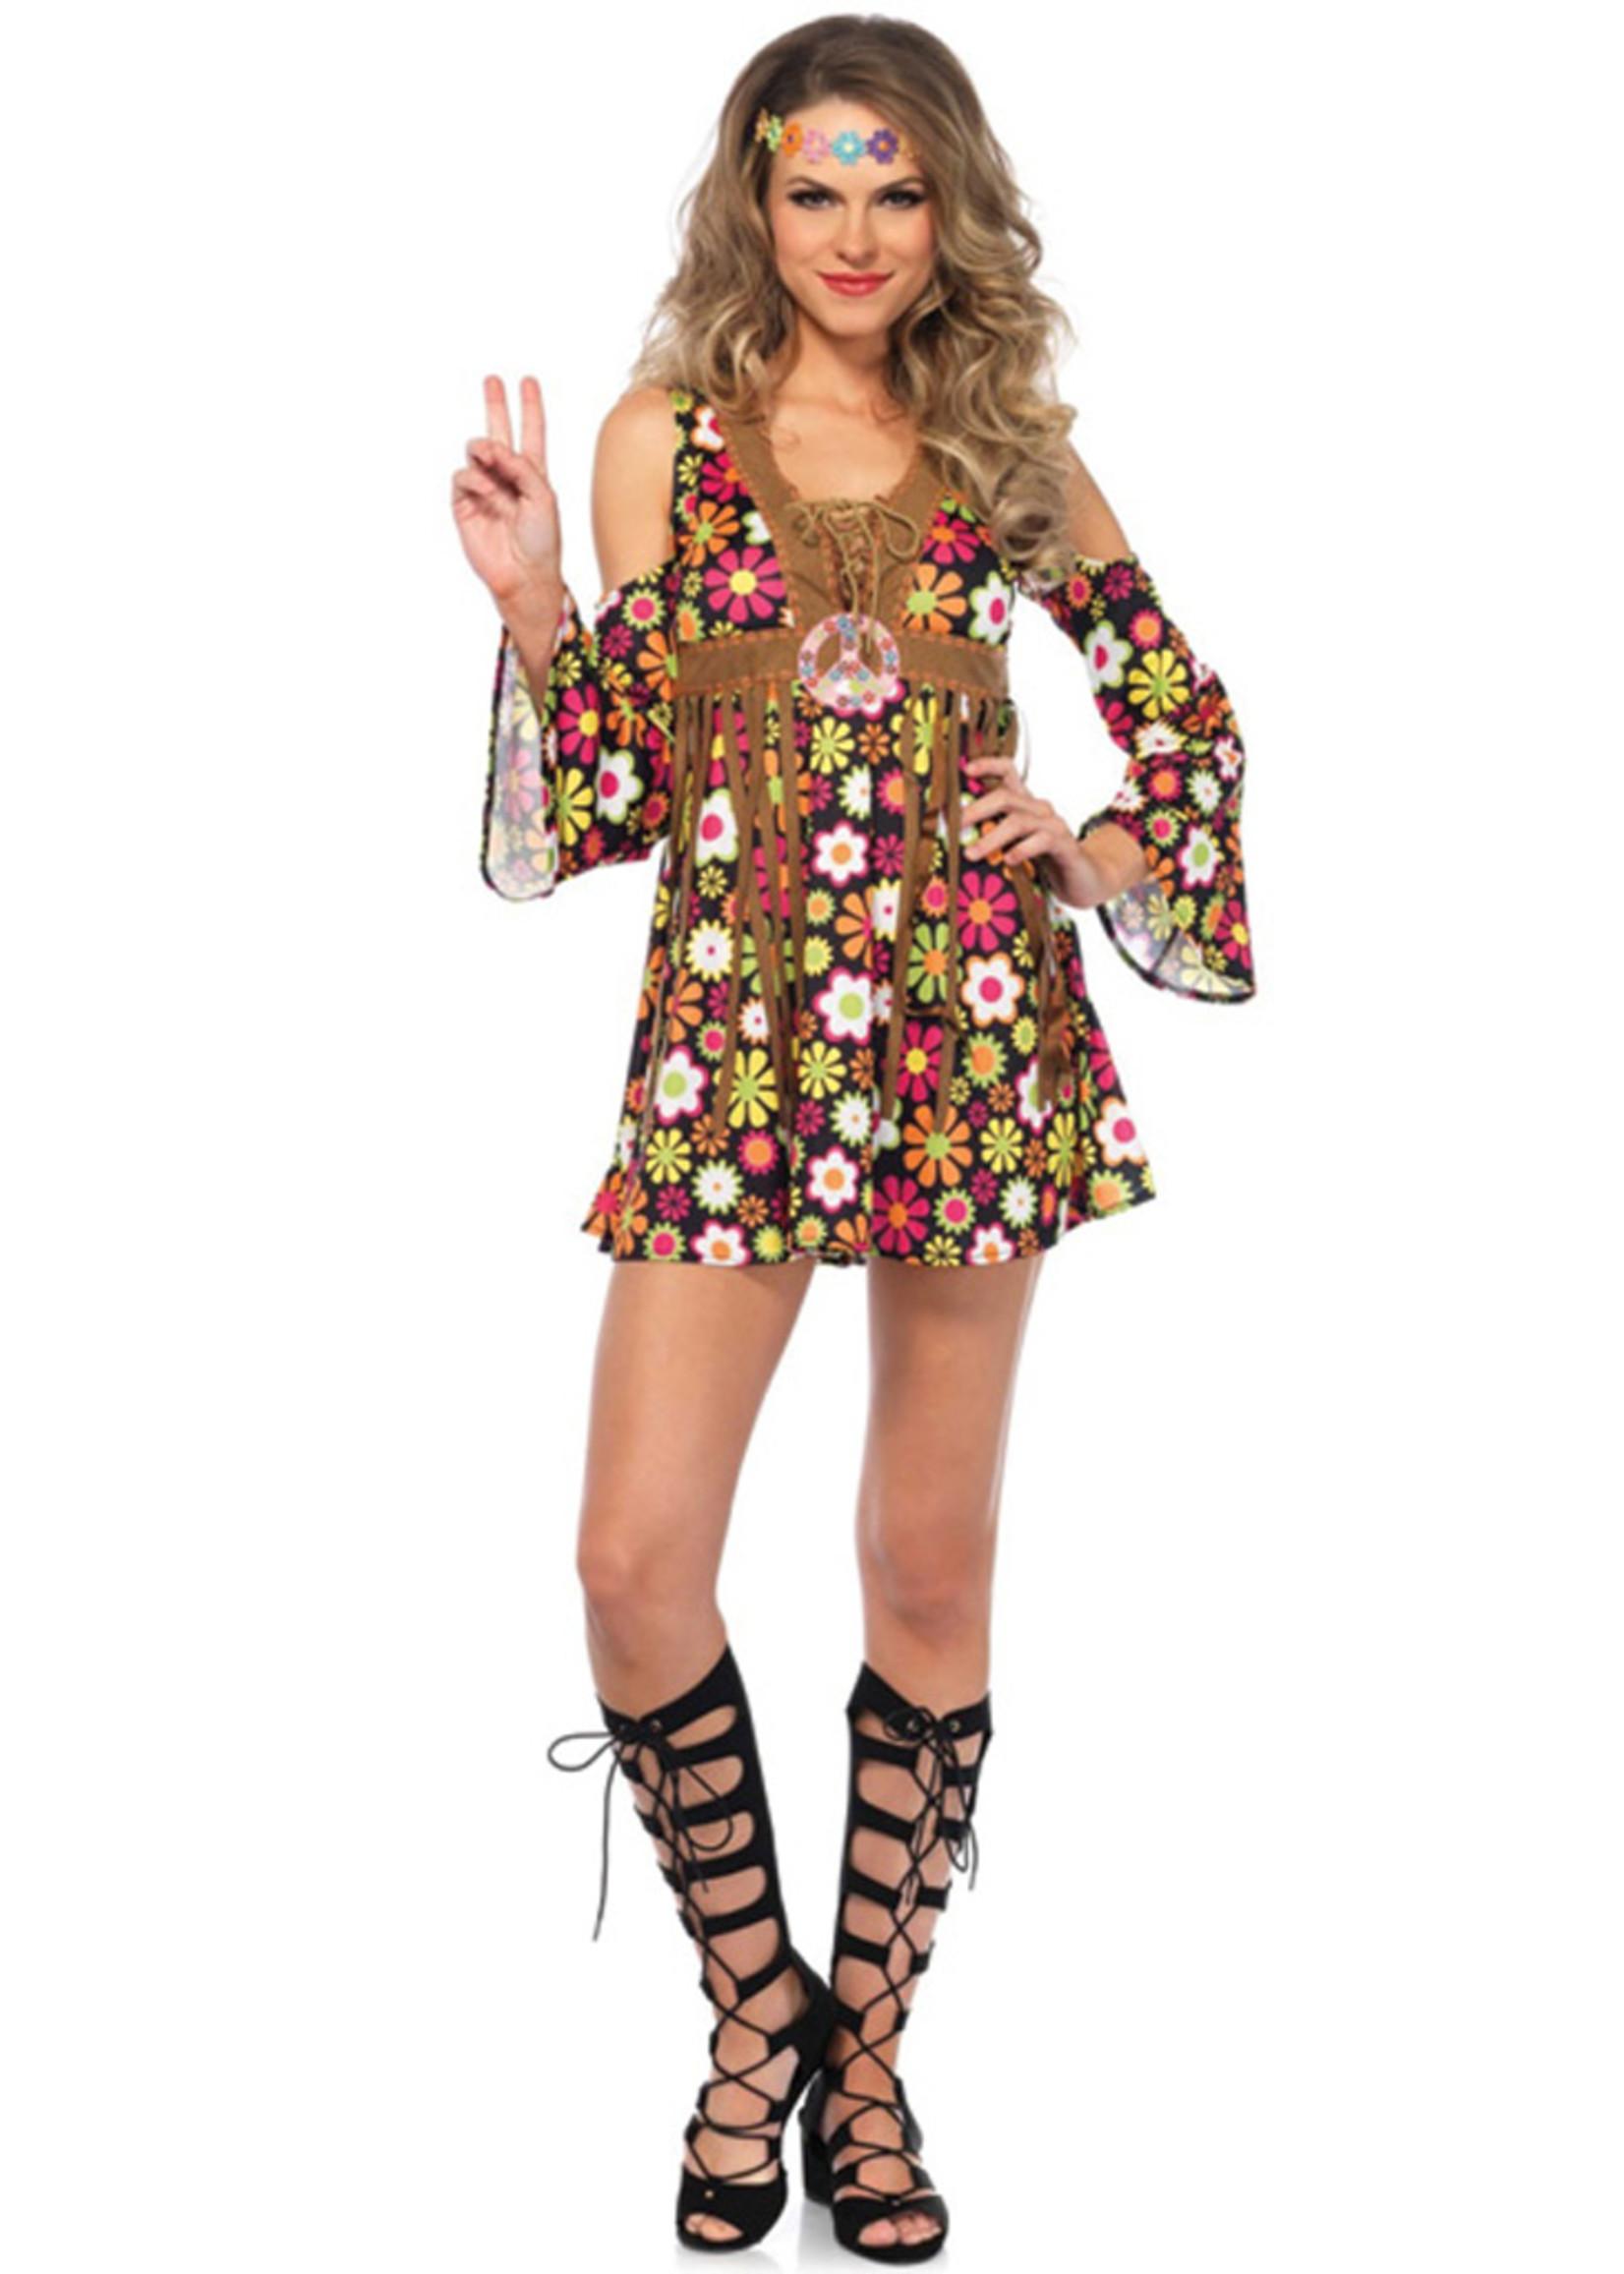 LEG AVENUE Starflower Hippie Costume - Women's